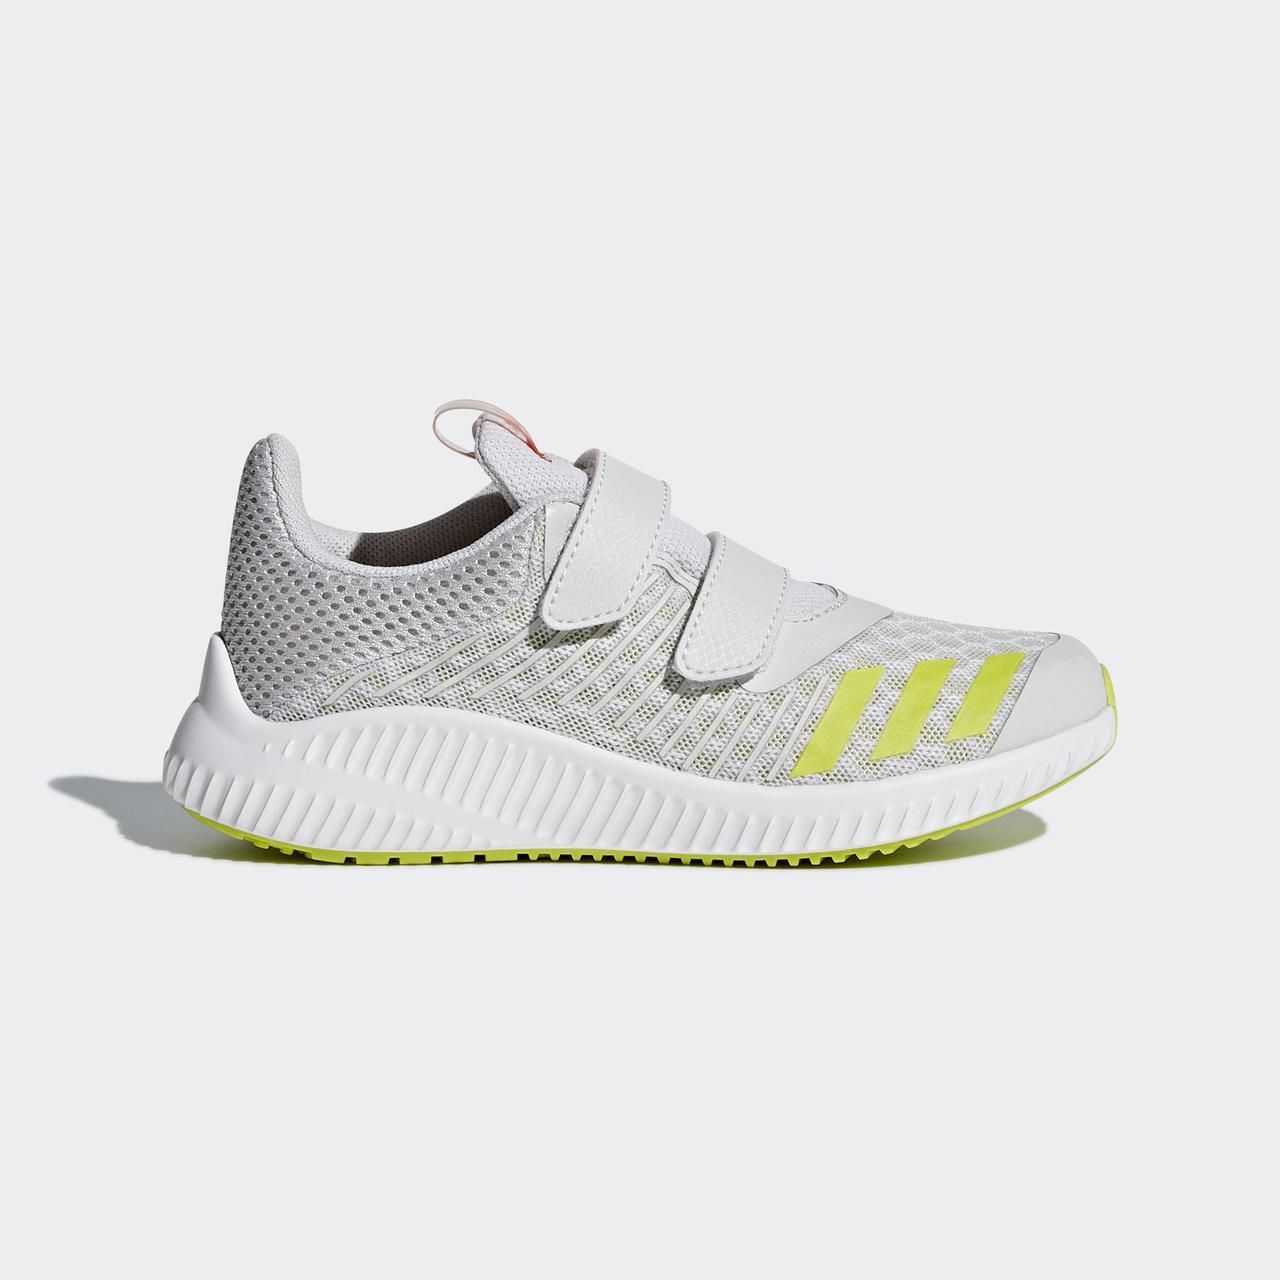 a1bb59c3 Купить Детские кроссовки Adidas Performance Fortarun Cool (Артикул ...